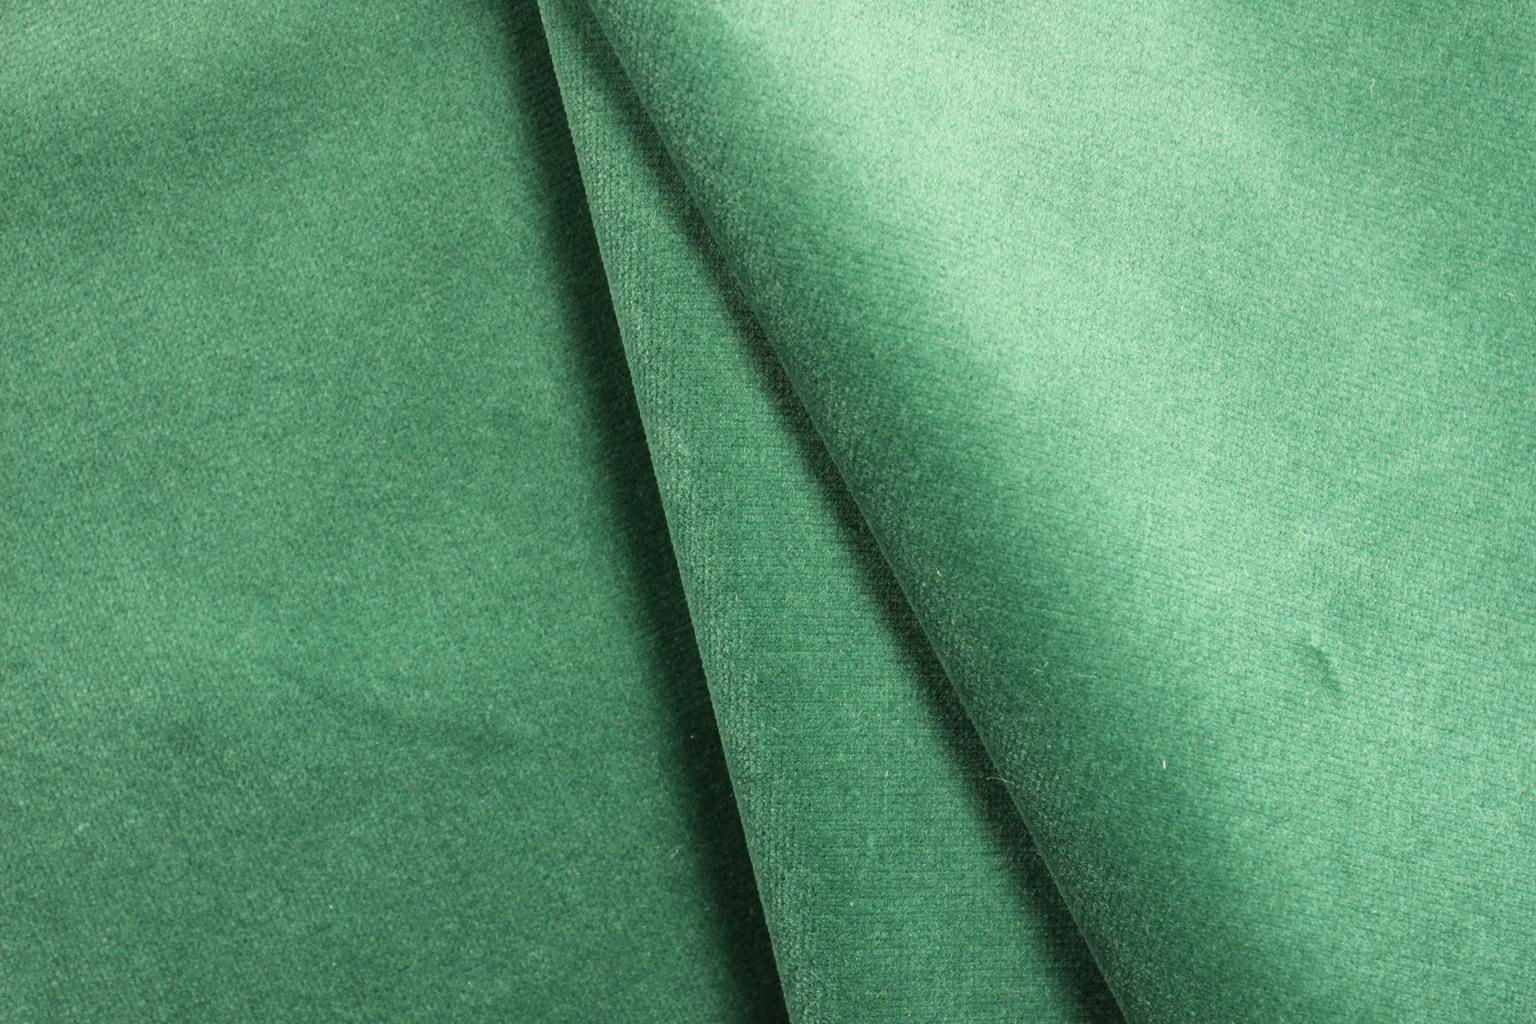 FENICE Emerald